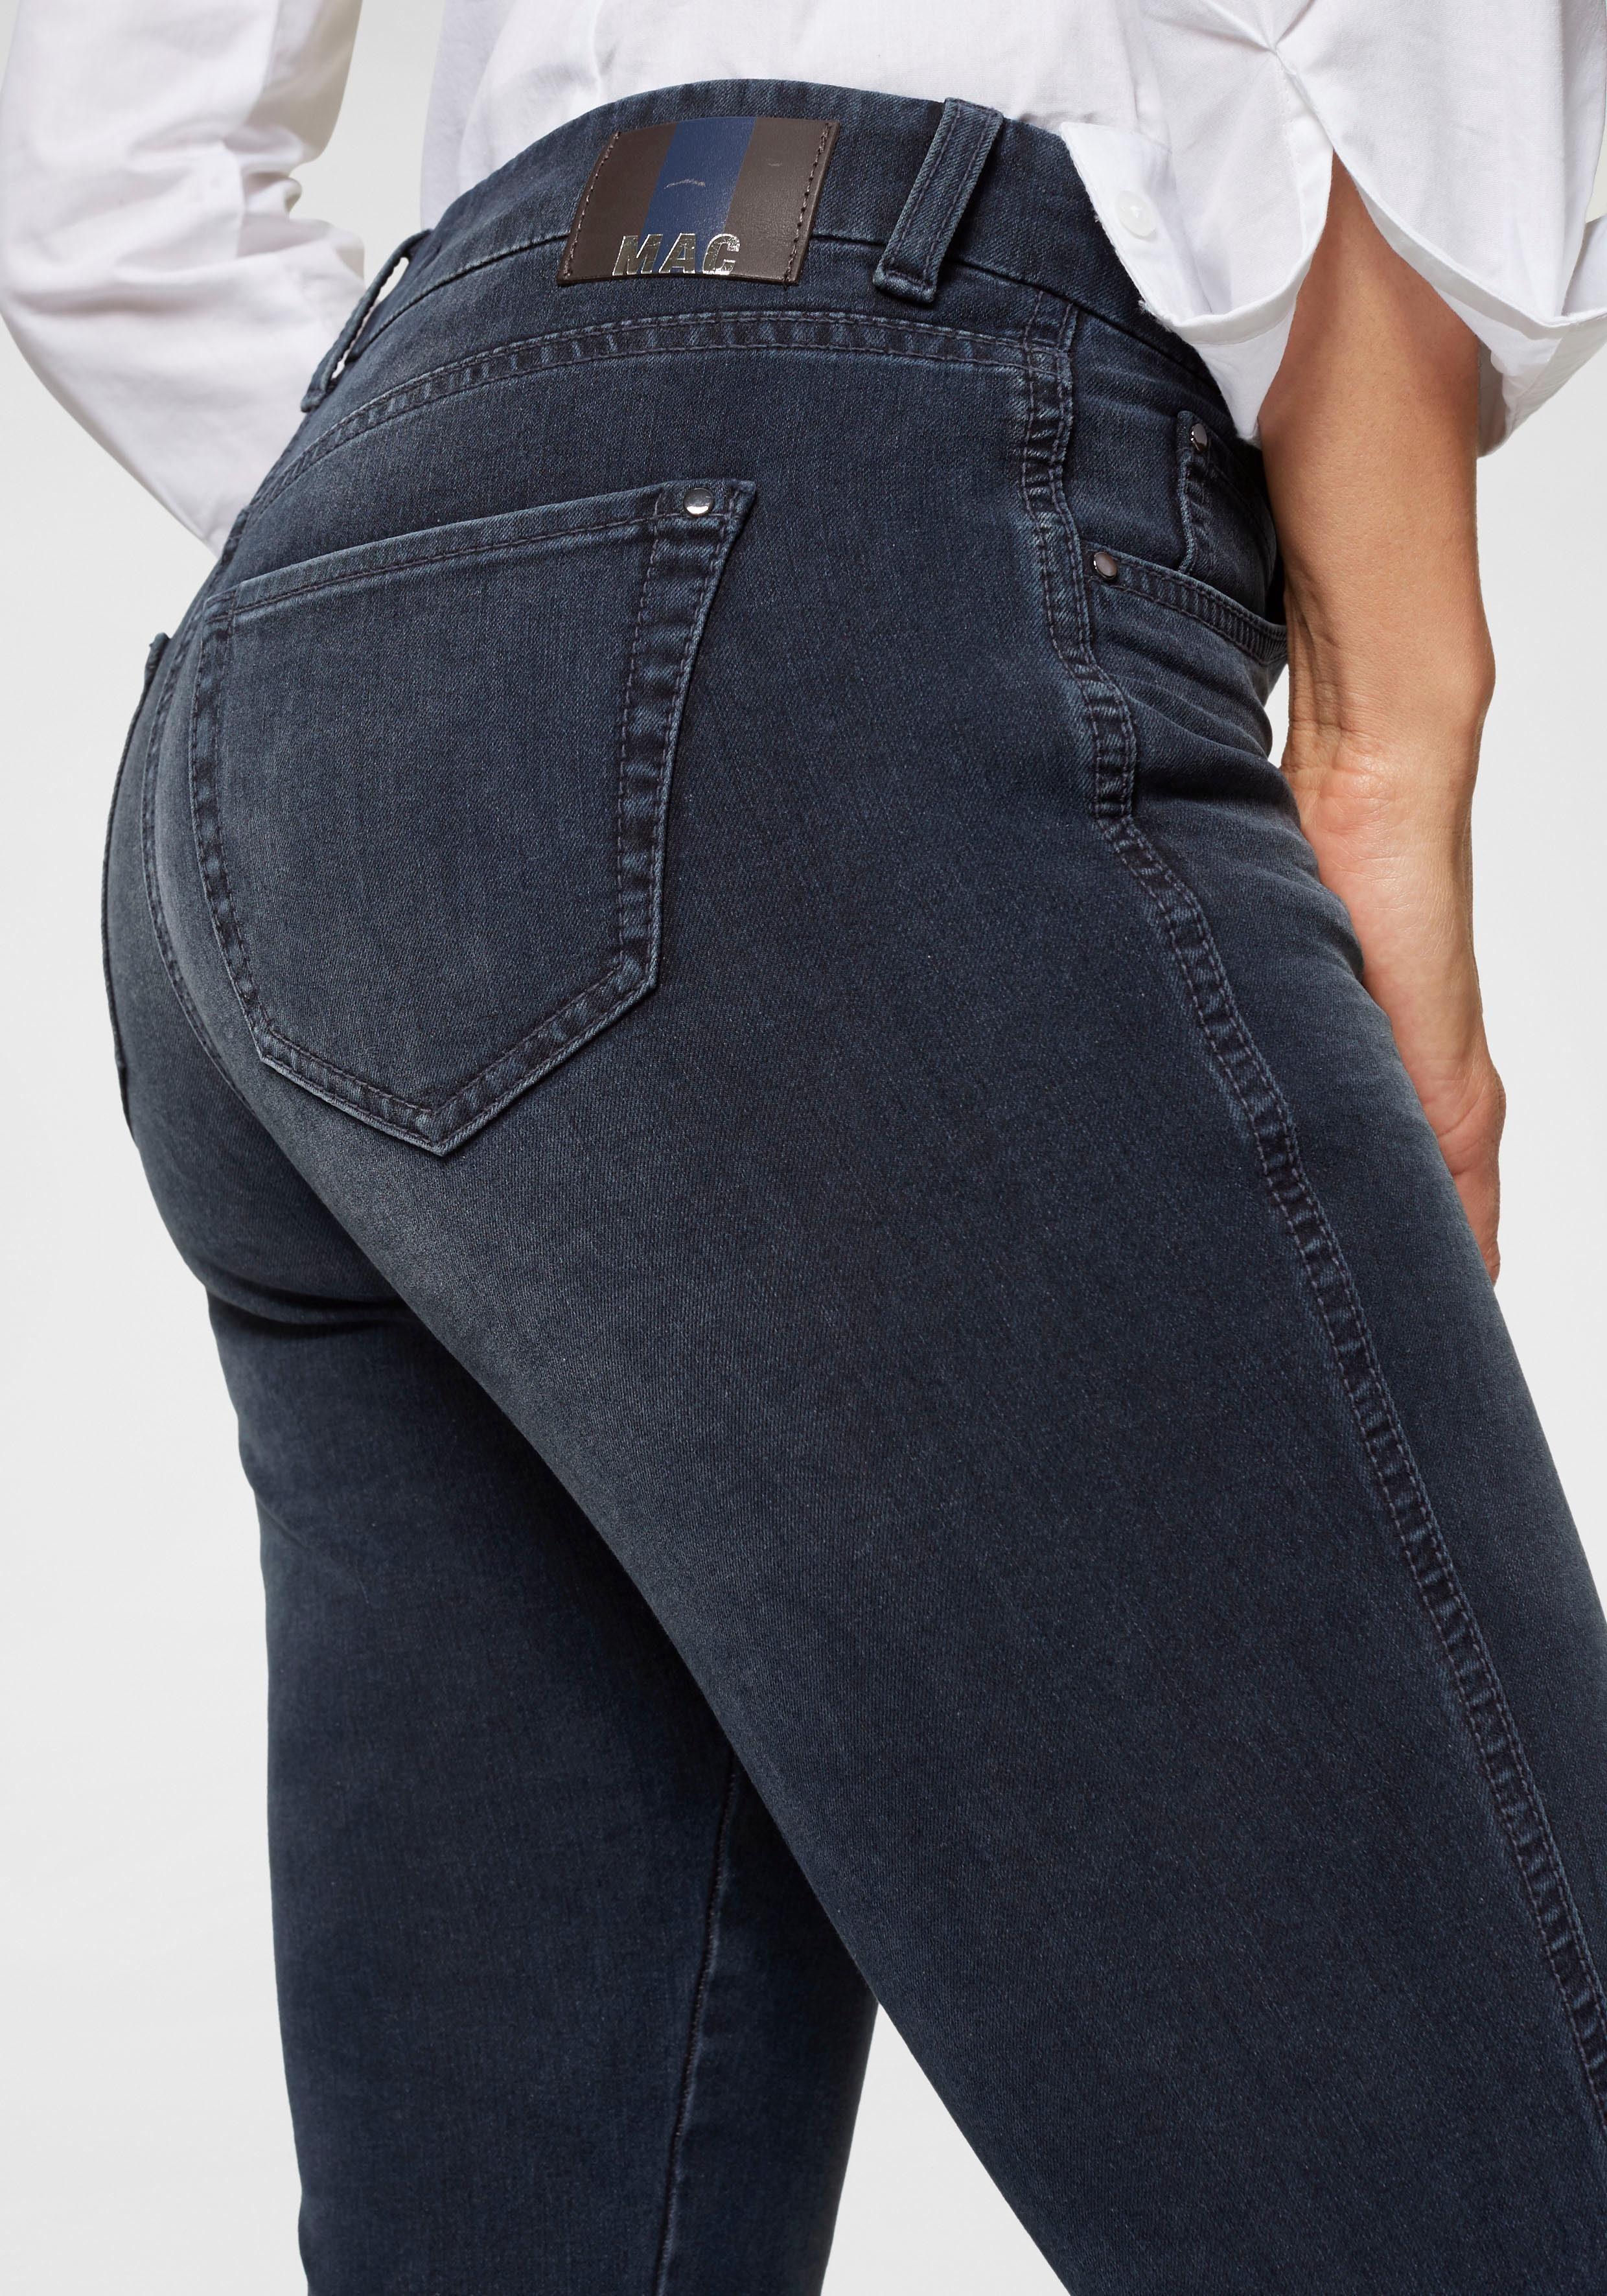 Form Bootcut Neue Bootcut »slim Modernem Kaufen Online In Mac jeans boot« myn80wvNO